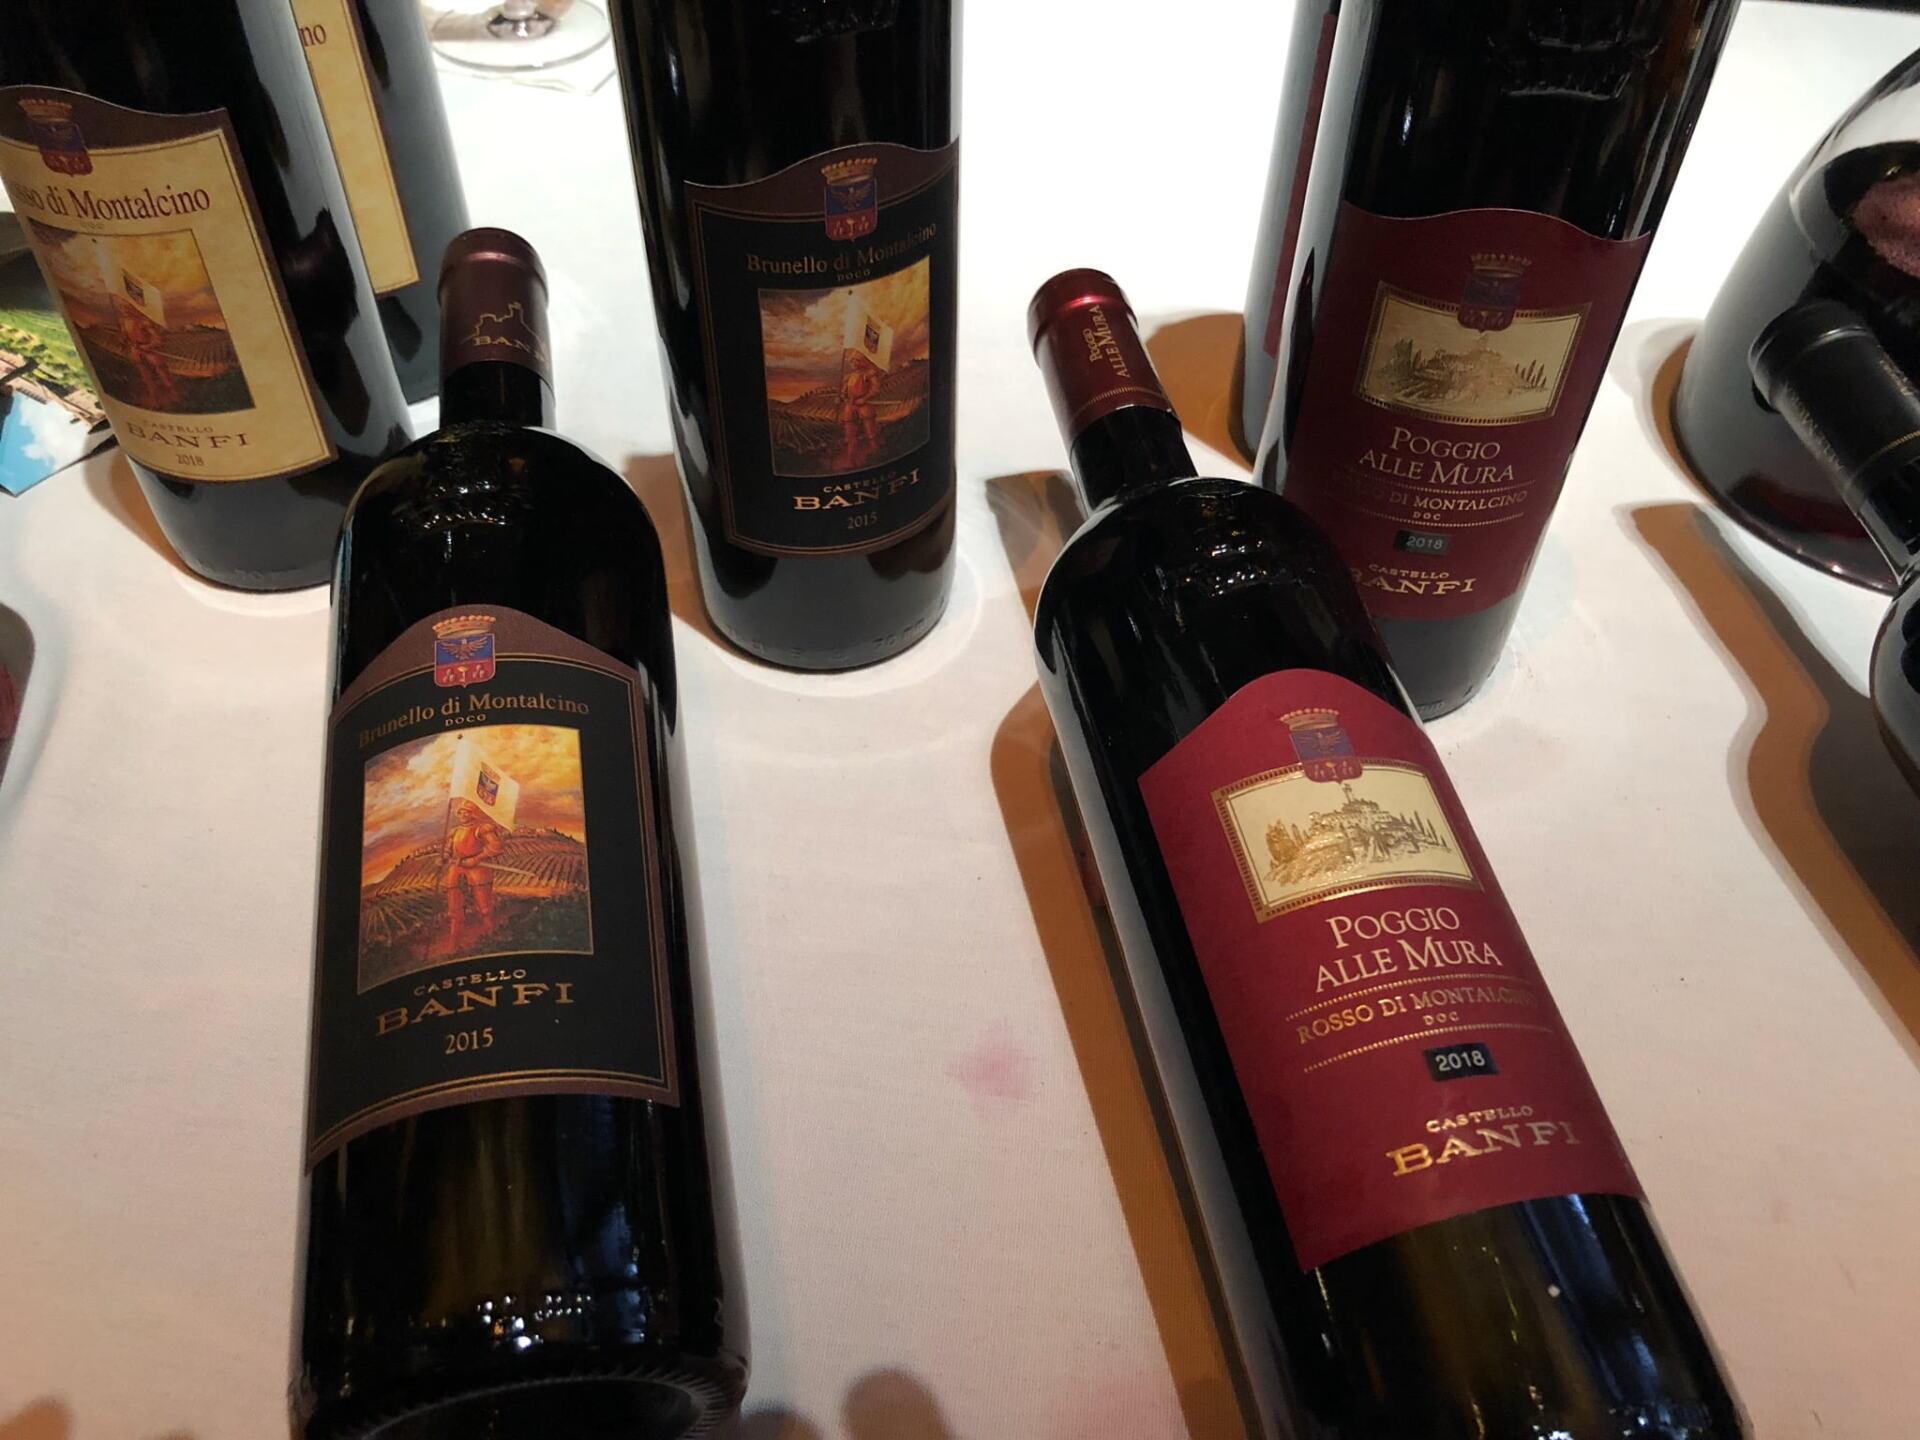 Castello Banfi wines